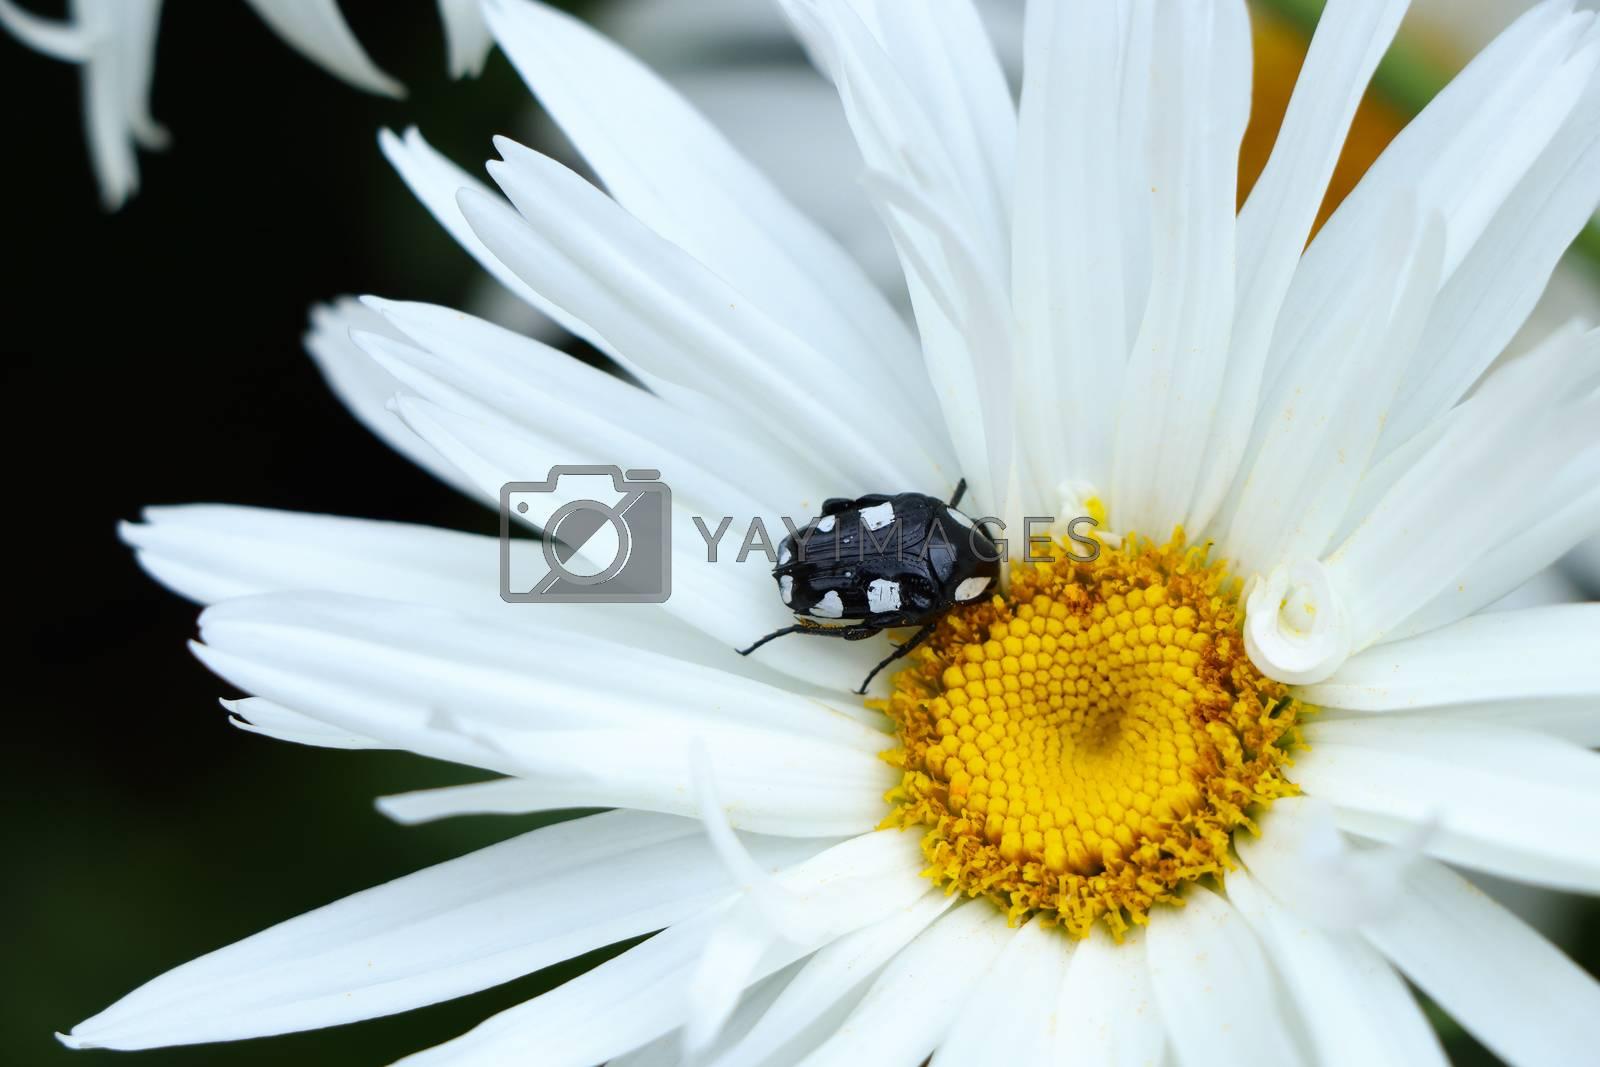 White-spotted fruit chafer beetle (Mausoleopsis amabilis) on a large white daisy flower, Plettenberg Bay, South Africa